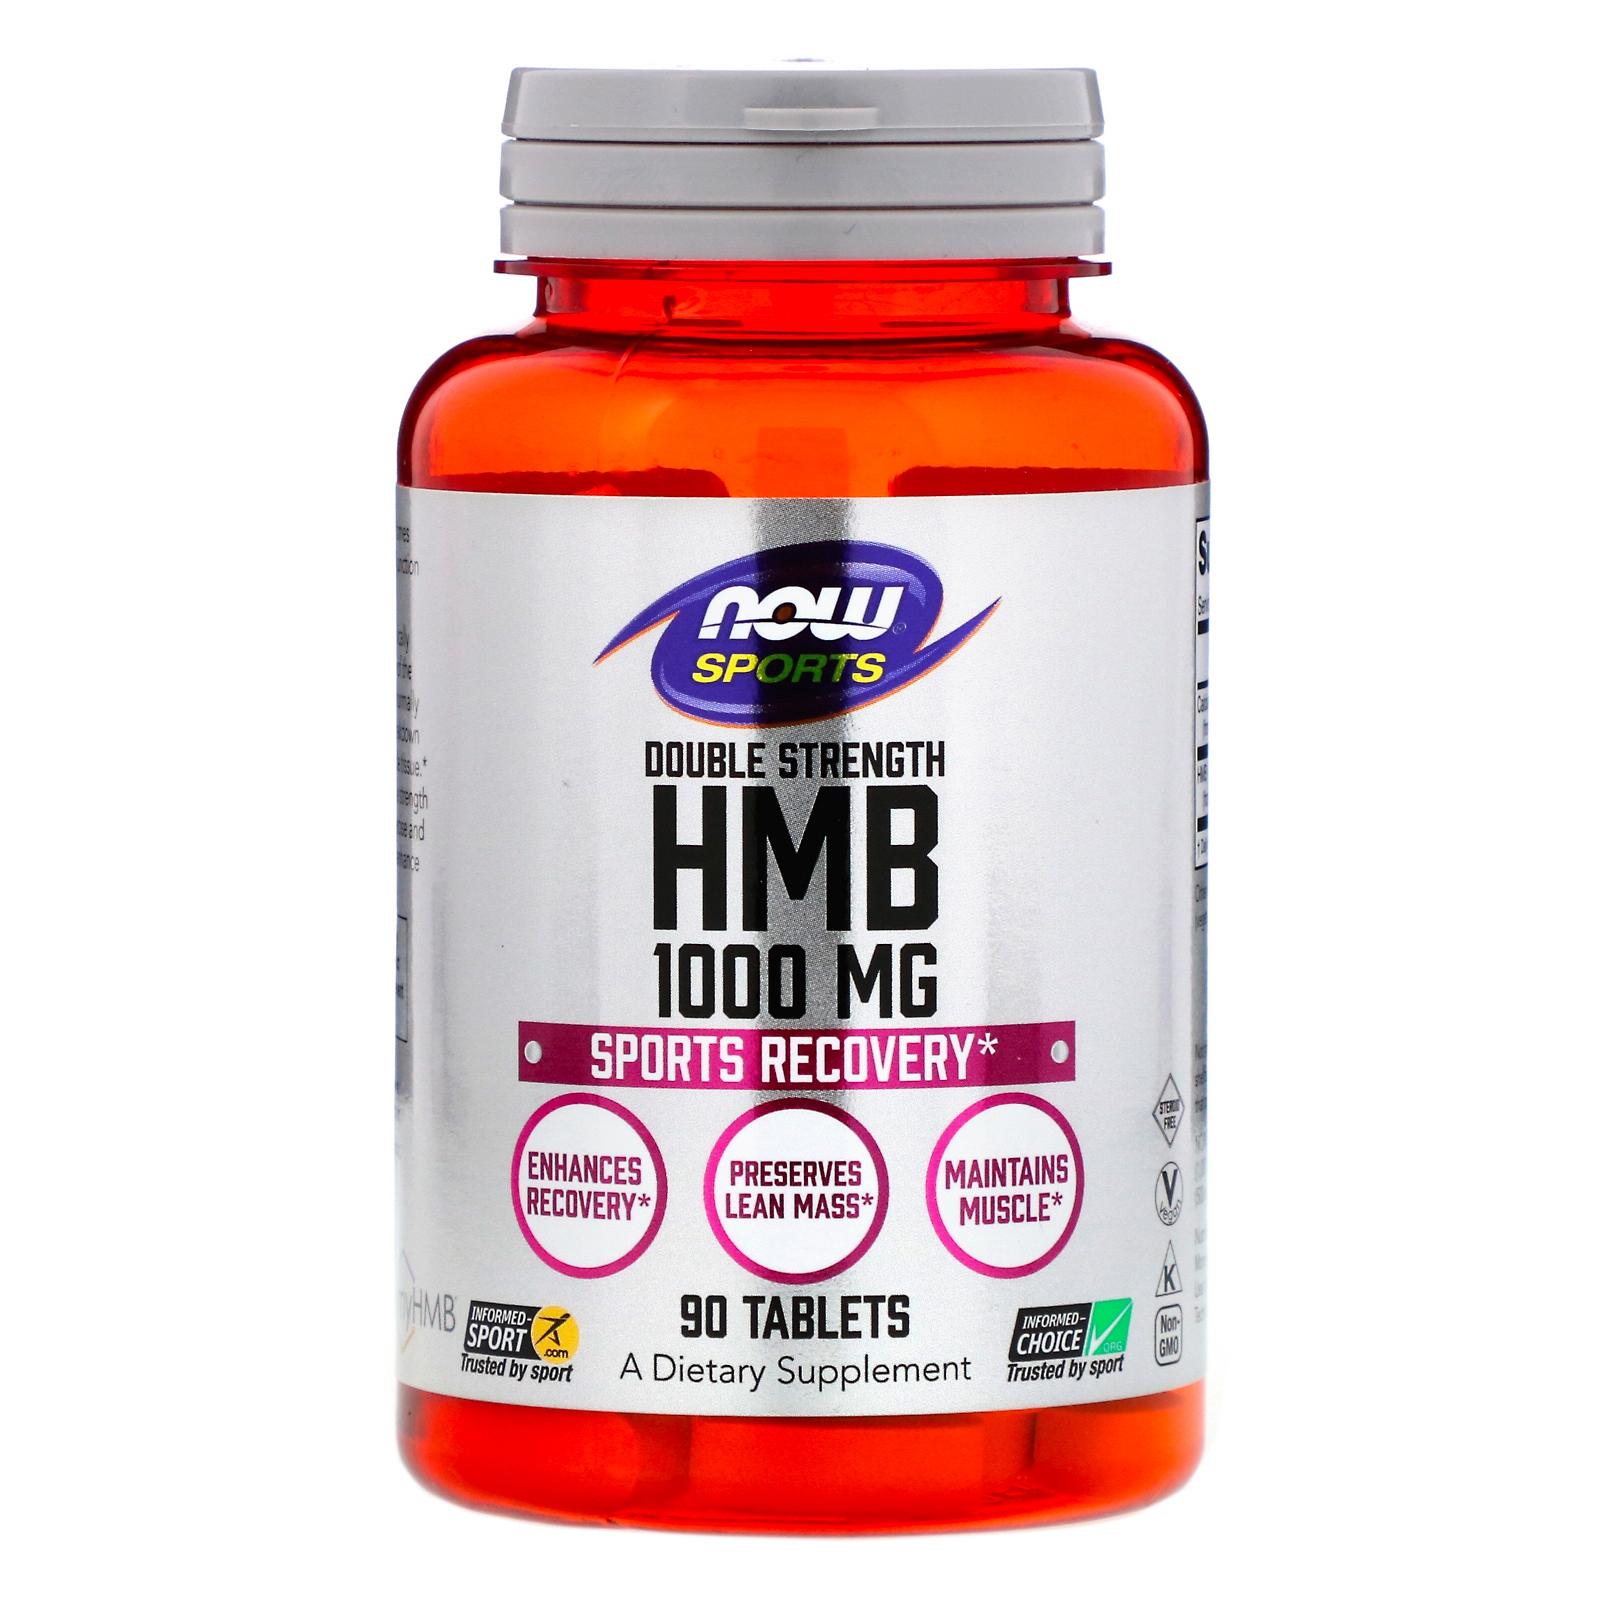 HMB - Double Strength 1.000 mg (90 tablets) - Now Foods | www.Sjopz.com |